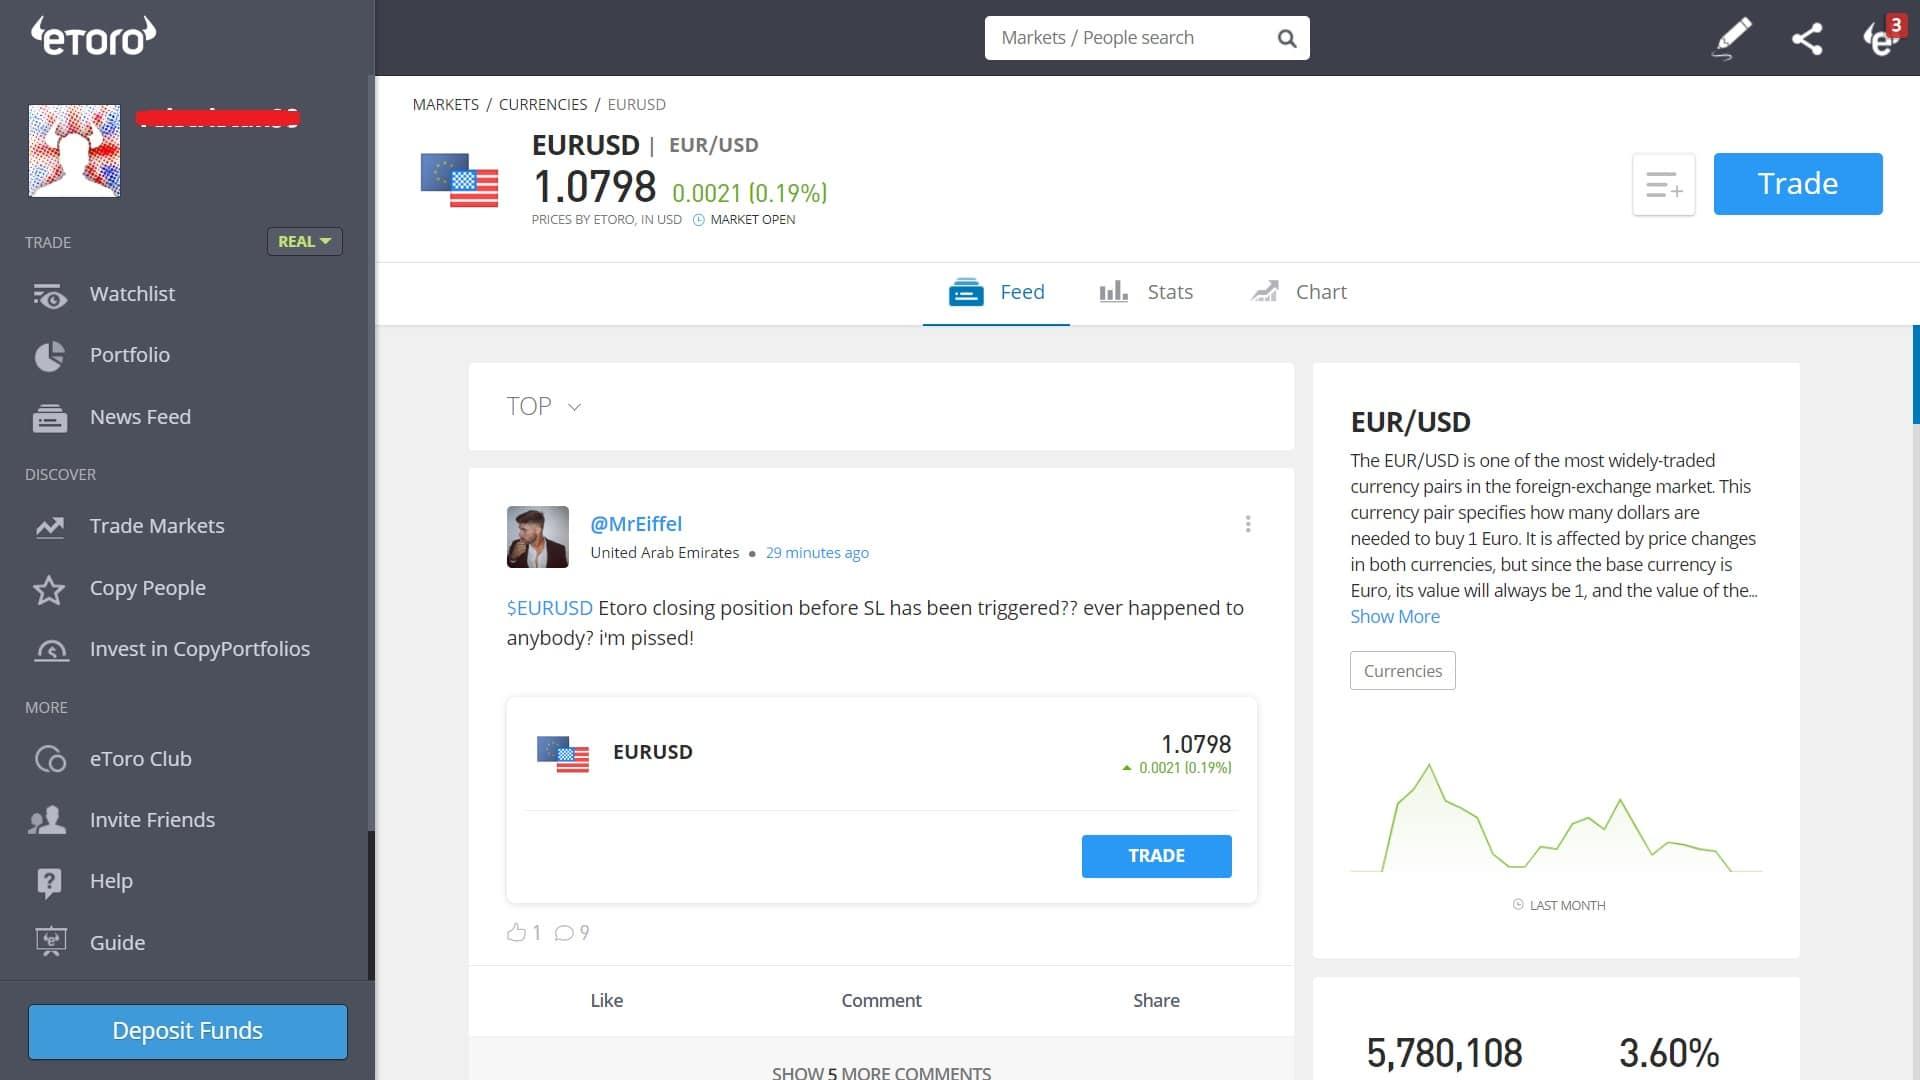 EURUSD trading on eToro's platform